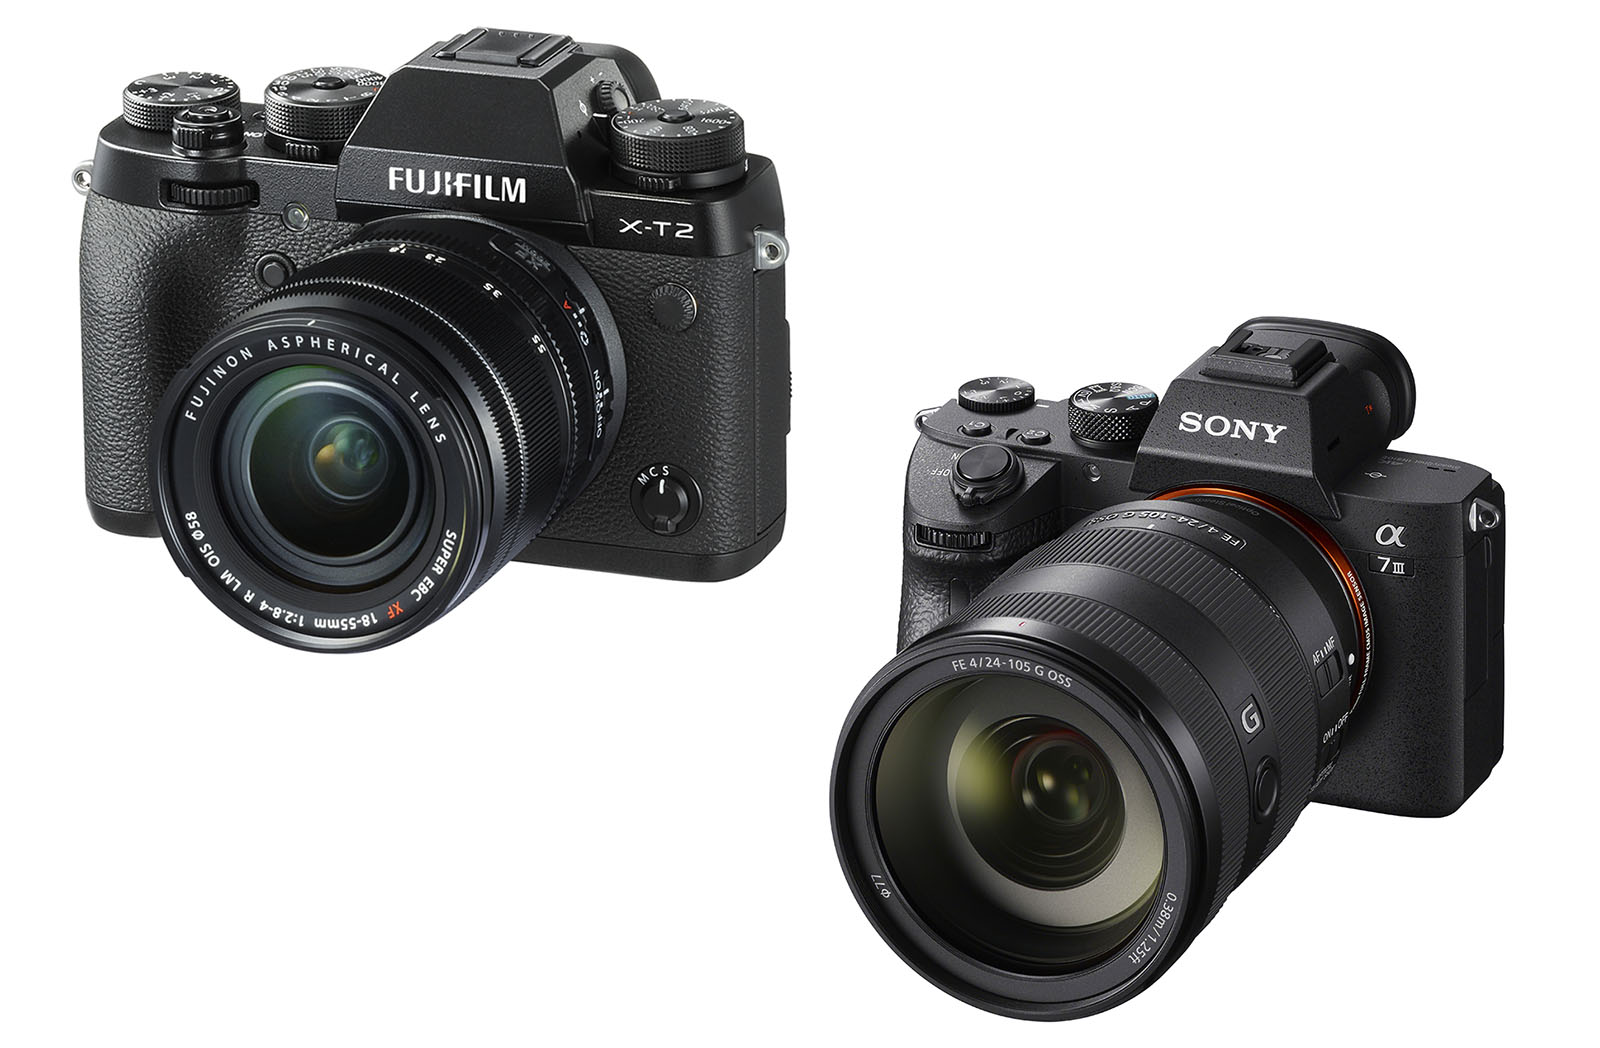 The Wandering Lensman: Fujifilm's Versus Sony's Customer